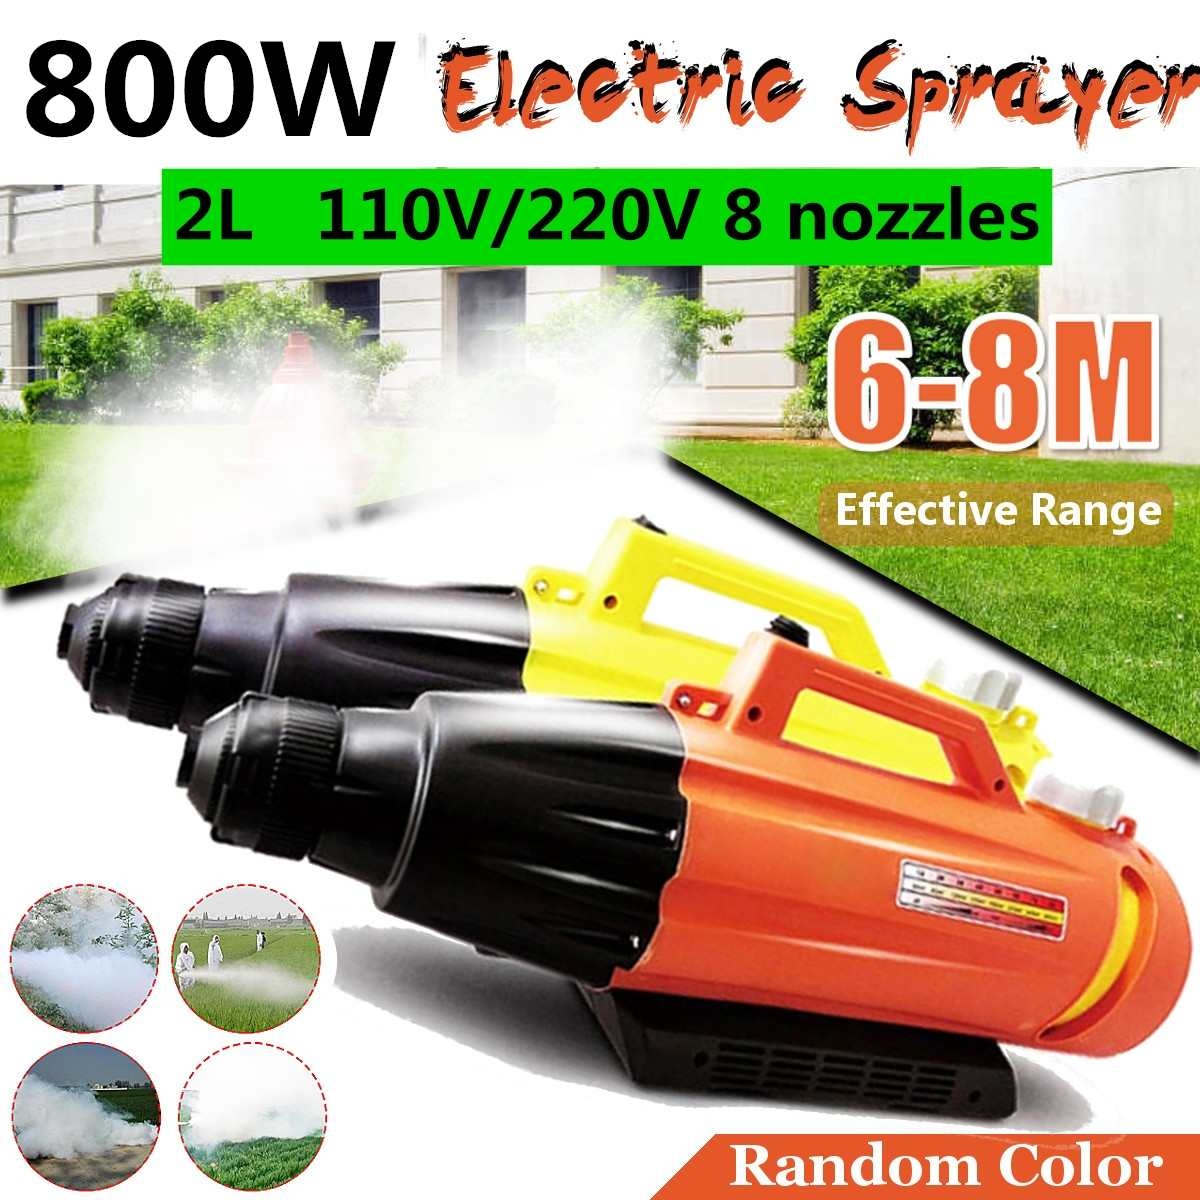 110V 220V 800W 2L Electric ULV Fogger Sprayer Disinfectant Portable Aerosol Sprayer Anti-Epidemic Nebulizer 8 Nozzles Farming